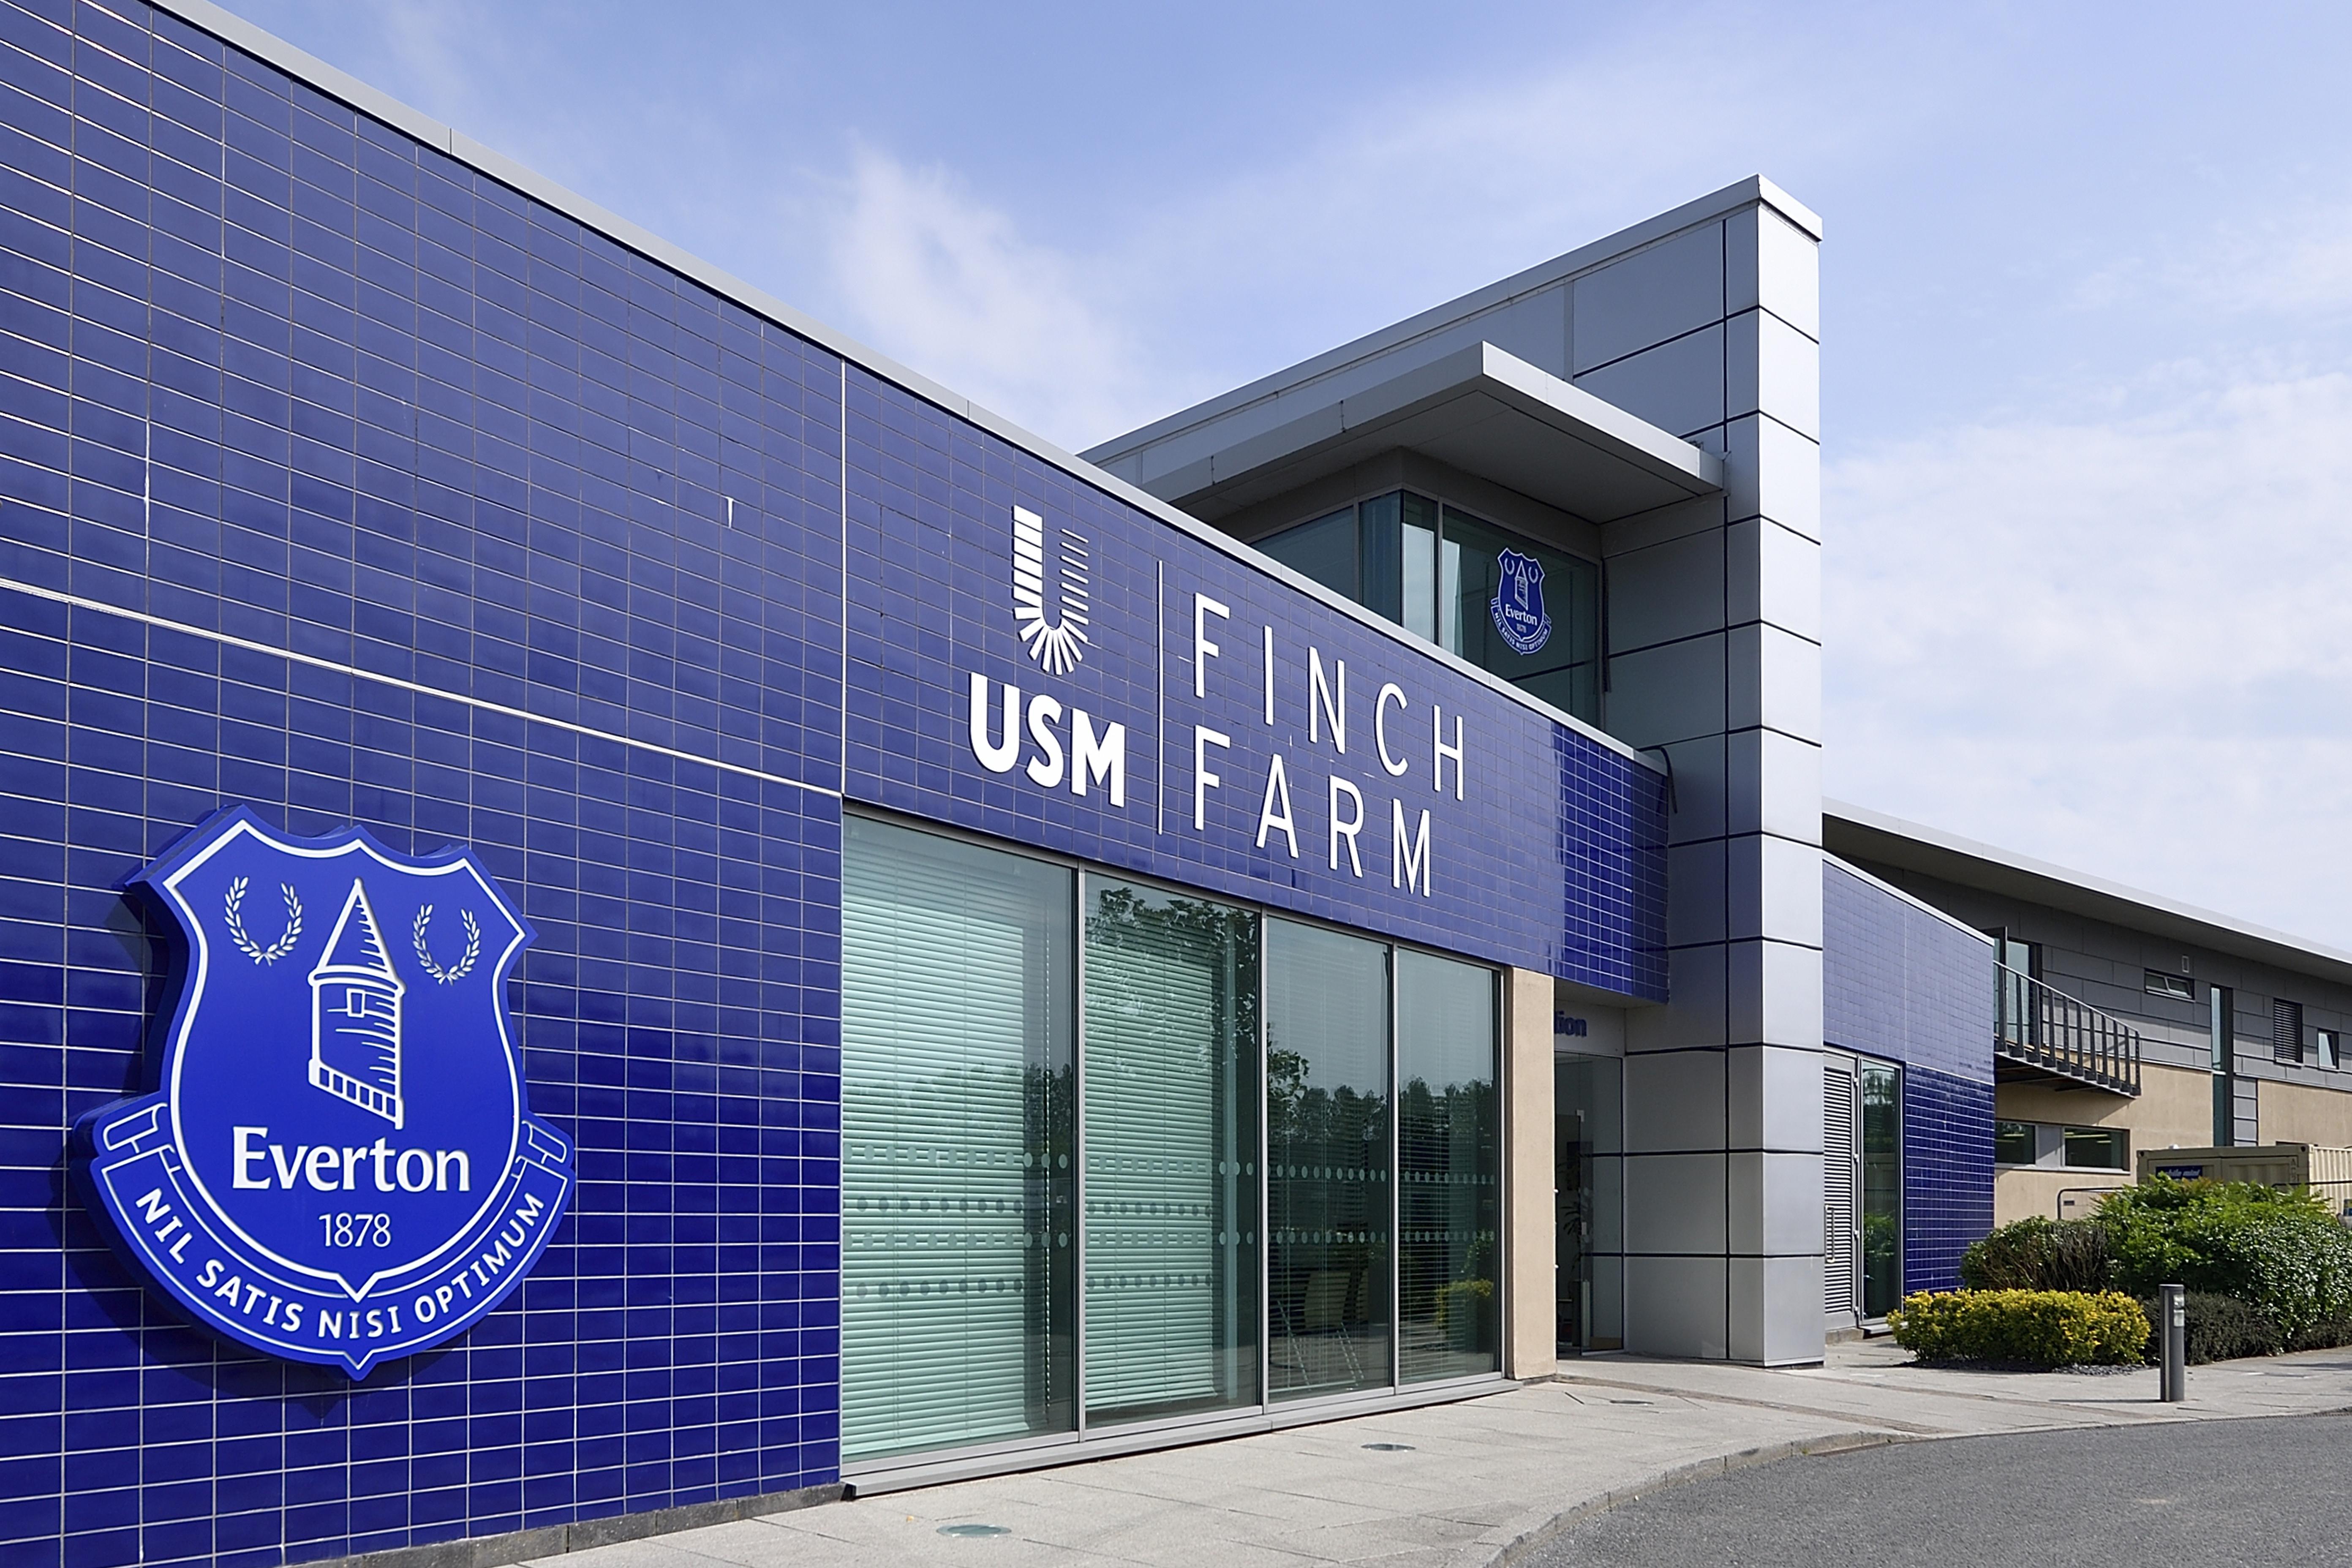 USM Finch Farm General Views